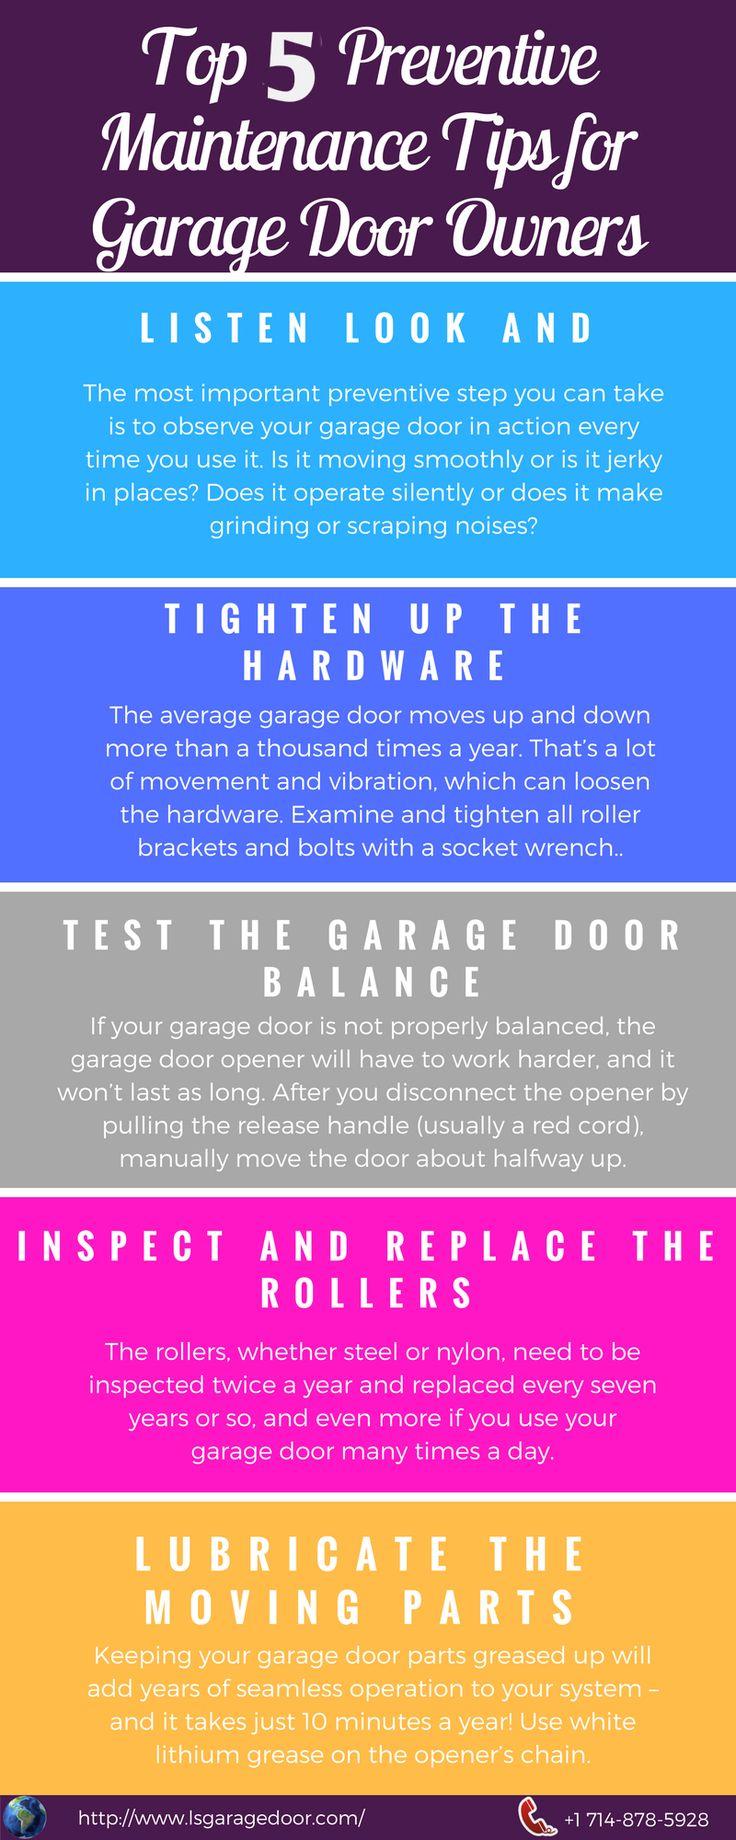 173 best garage door repairs images on pinterest carriage doors here are top 5 preventive maintenance tips for home owners to keep garage door rubansaba